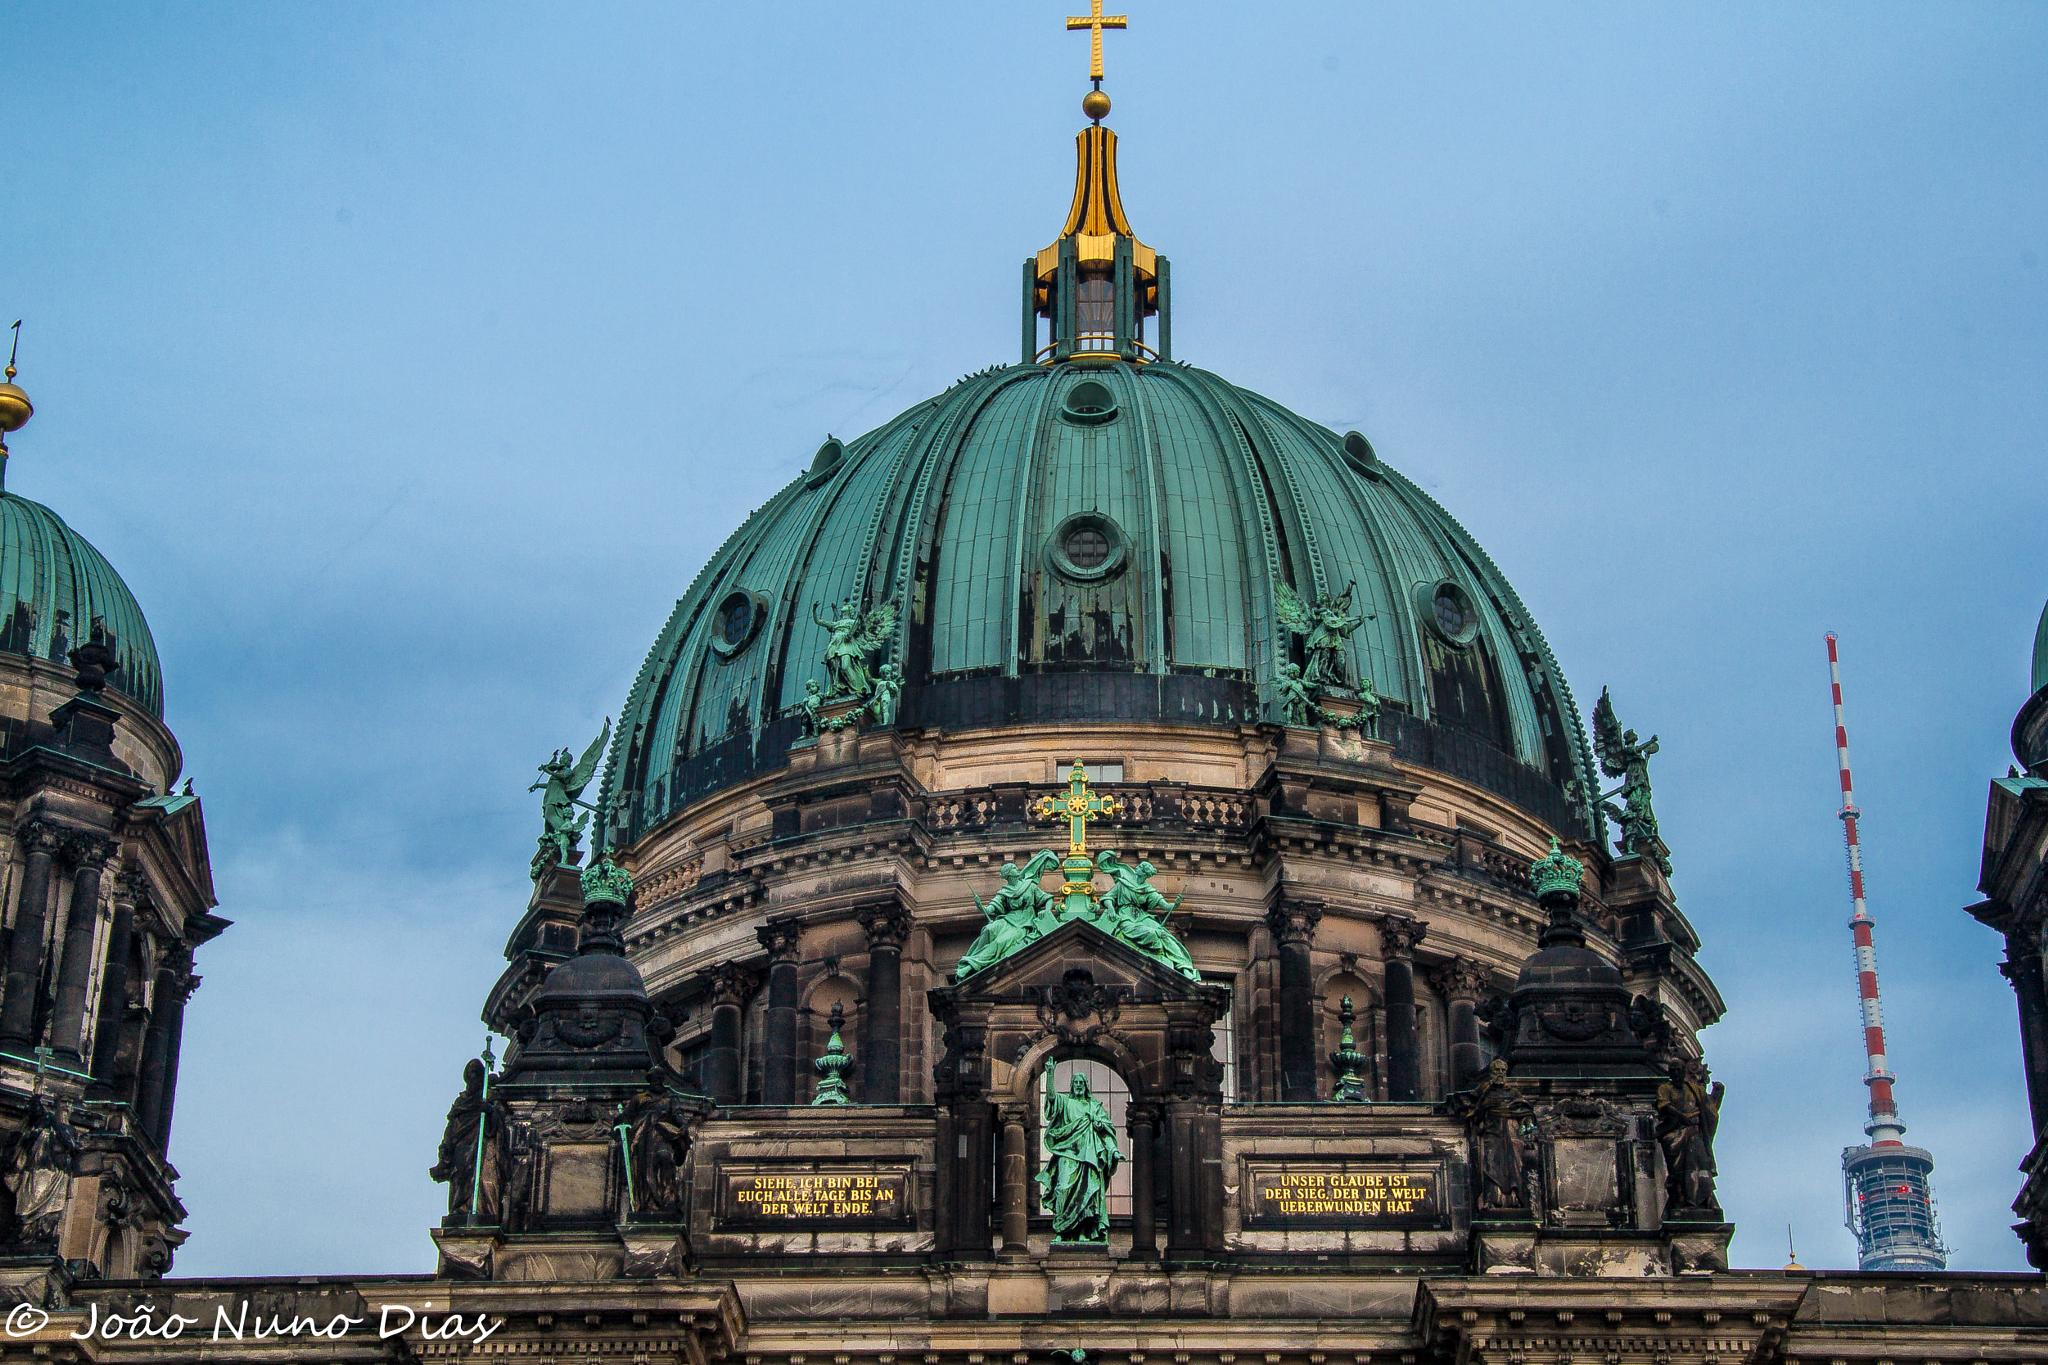 The Dome by Nuno Dias